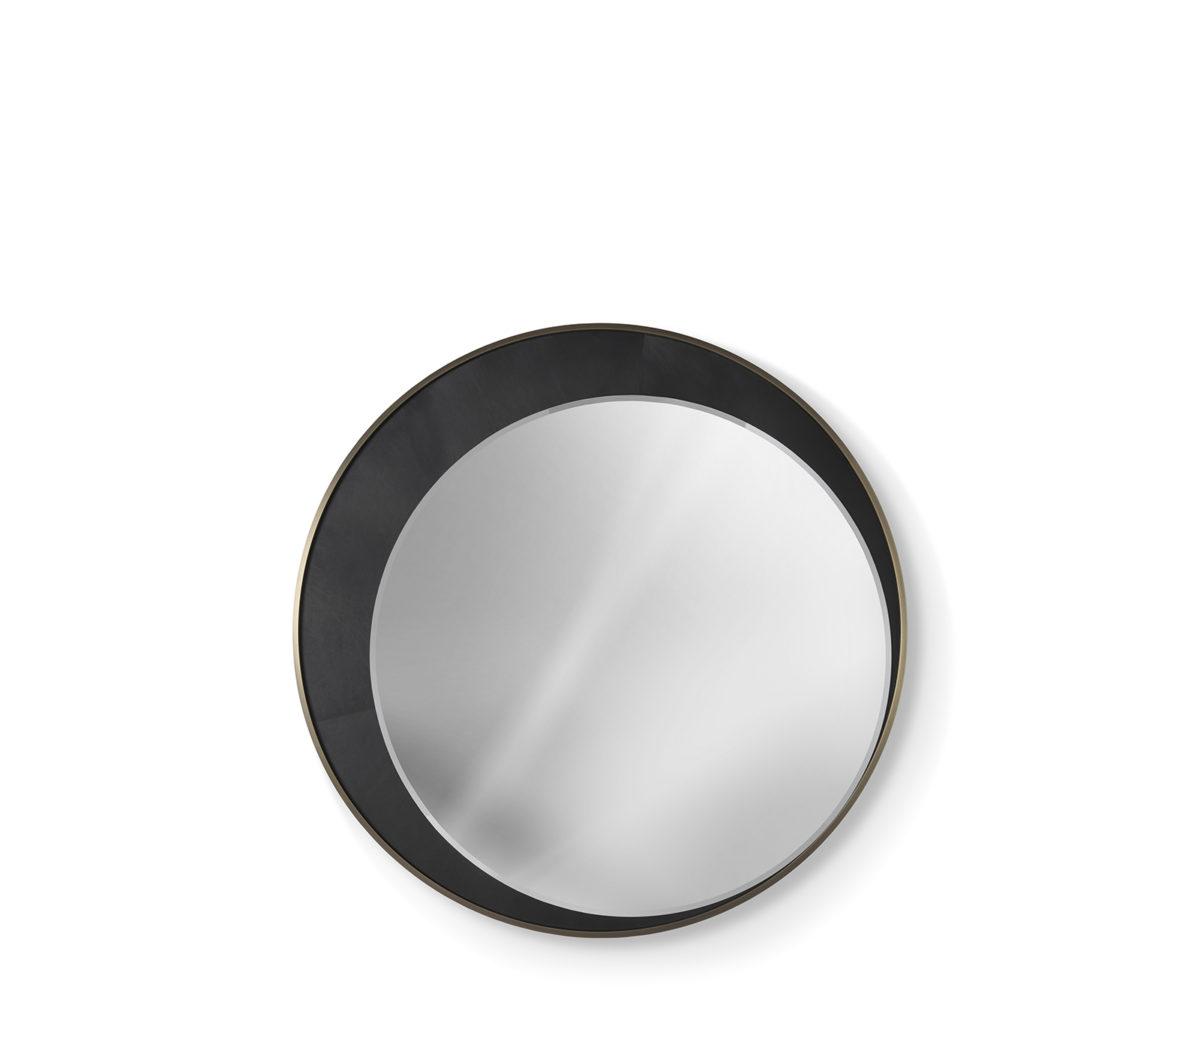 Gianfranco Ferre Home Carroll Mirror